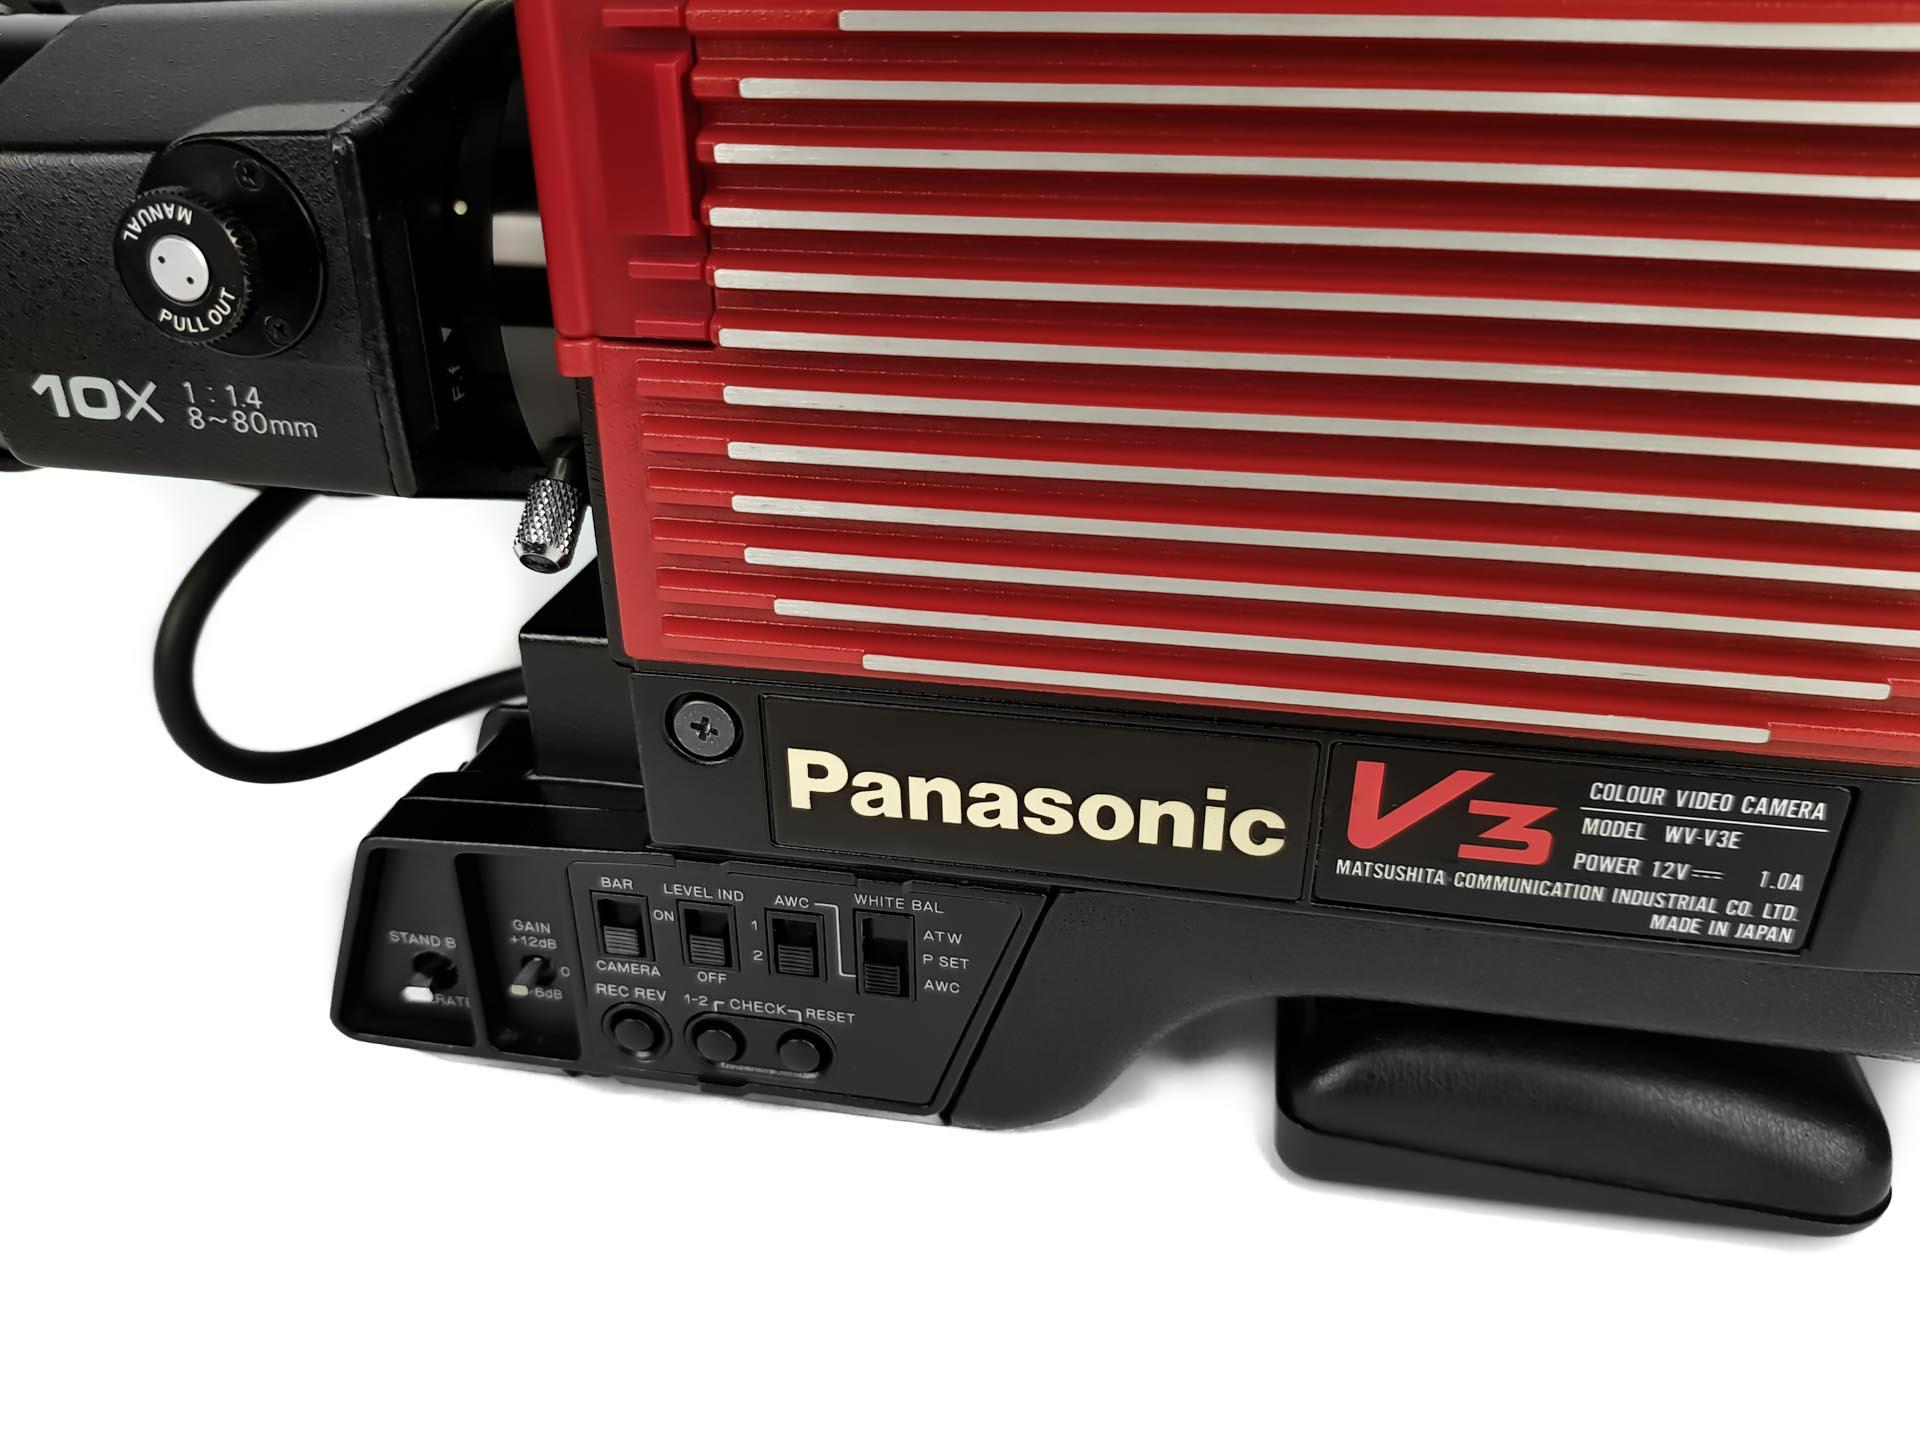 Panasonic WV-V3E - web - 3